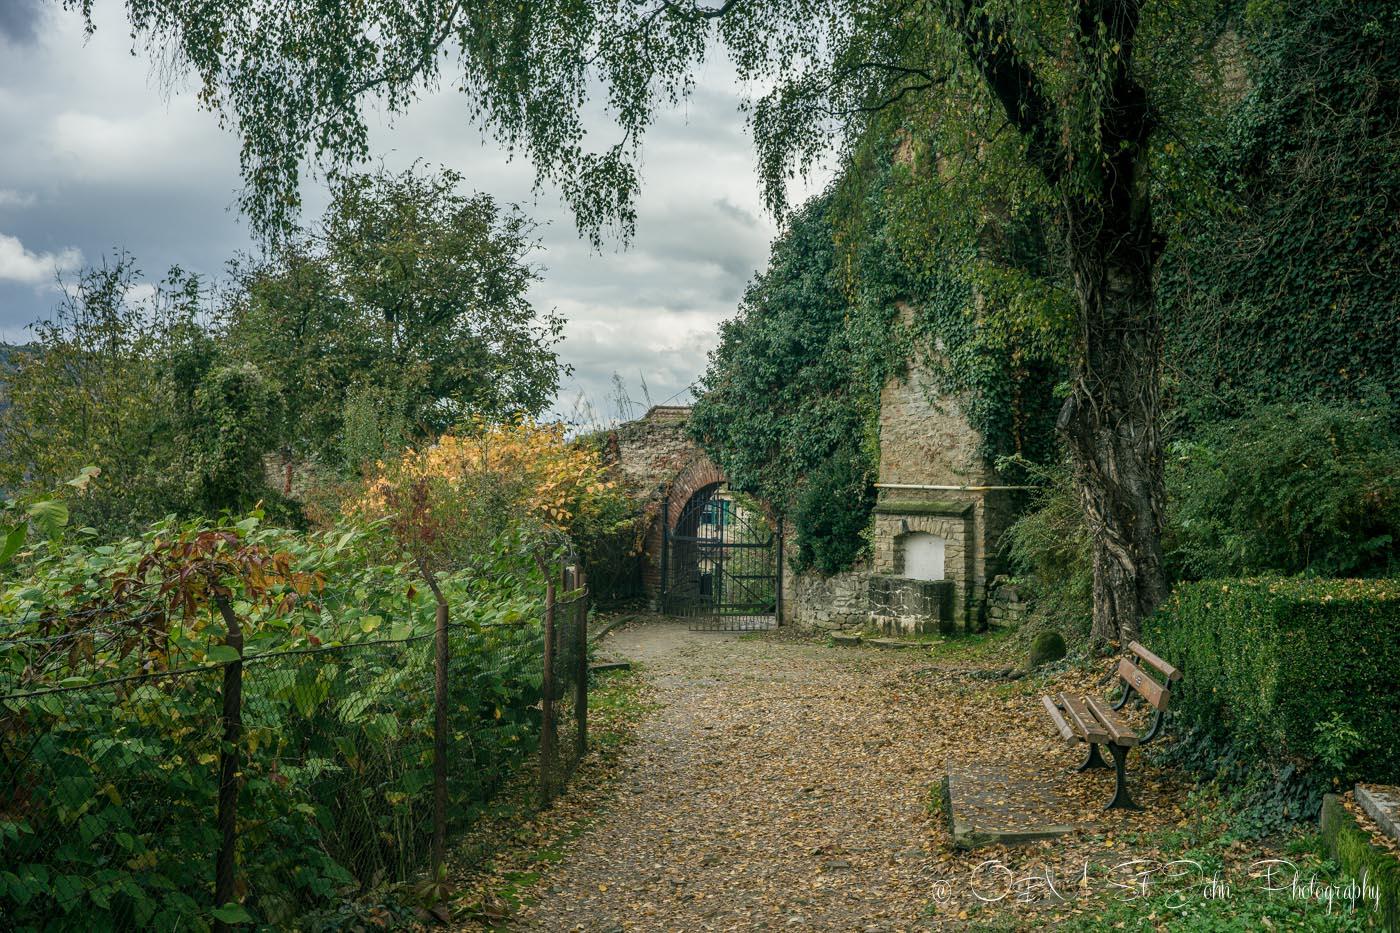 Entrance to the Sighisoara Cemetery, Romania